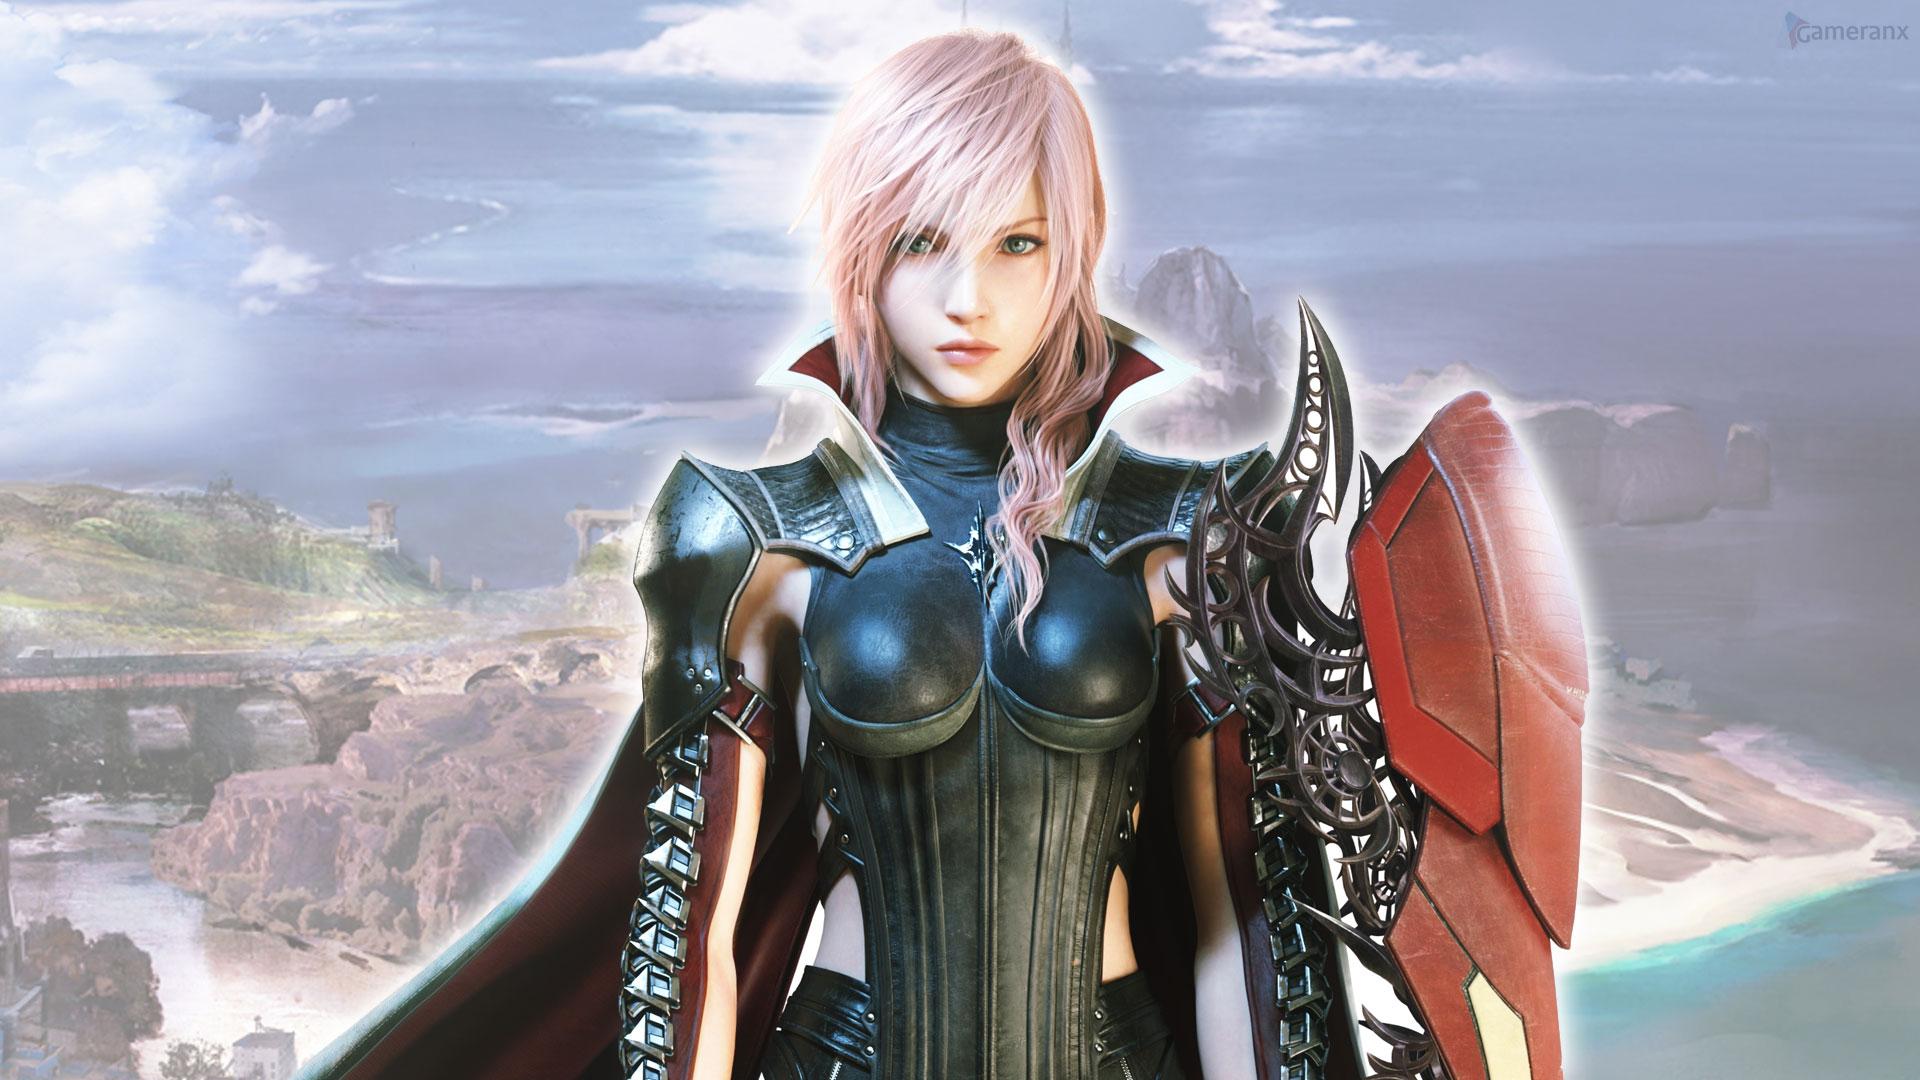 Lightning Returns | FFXIII by DivineImmortality | Beau